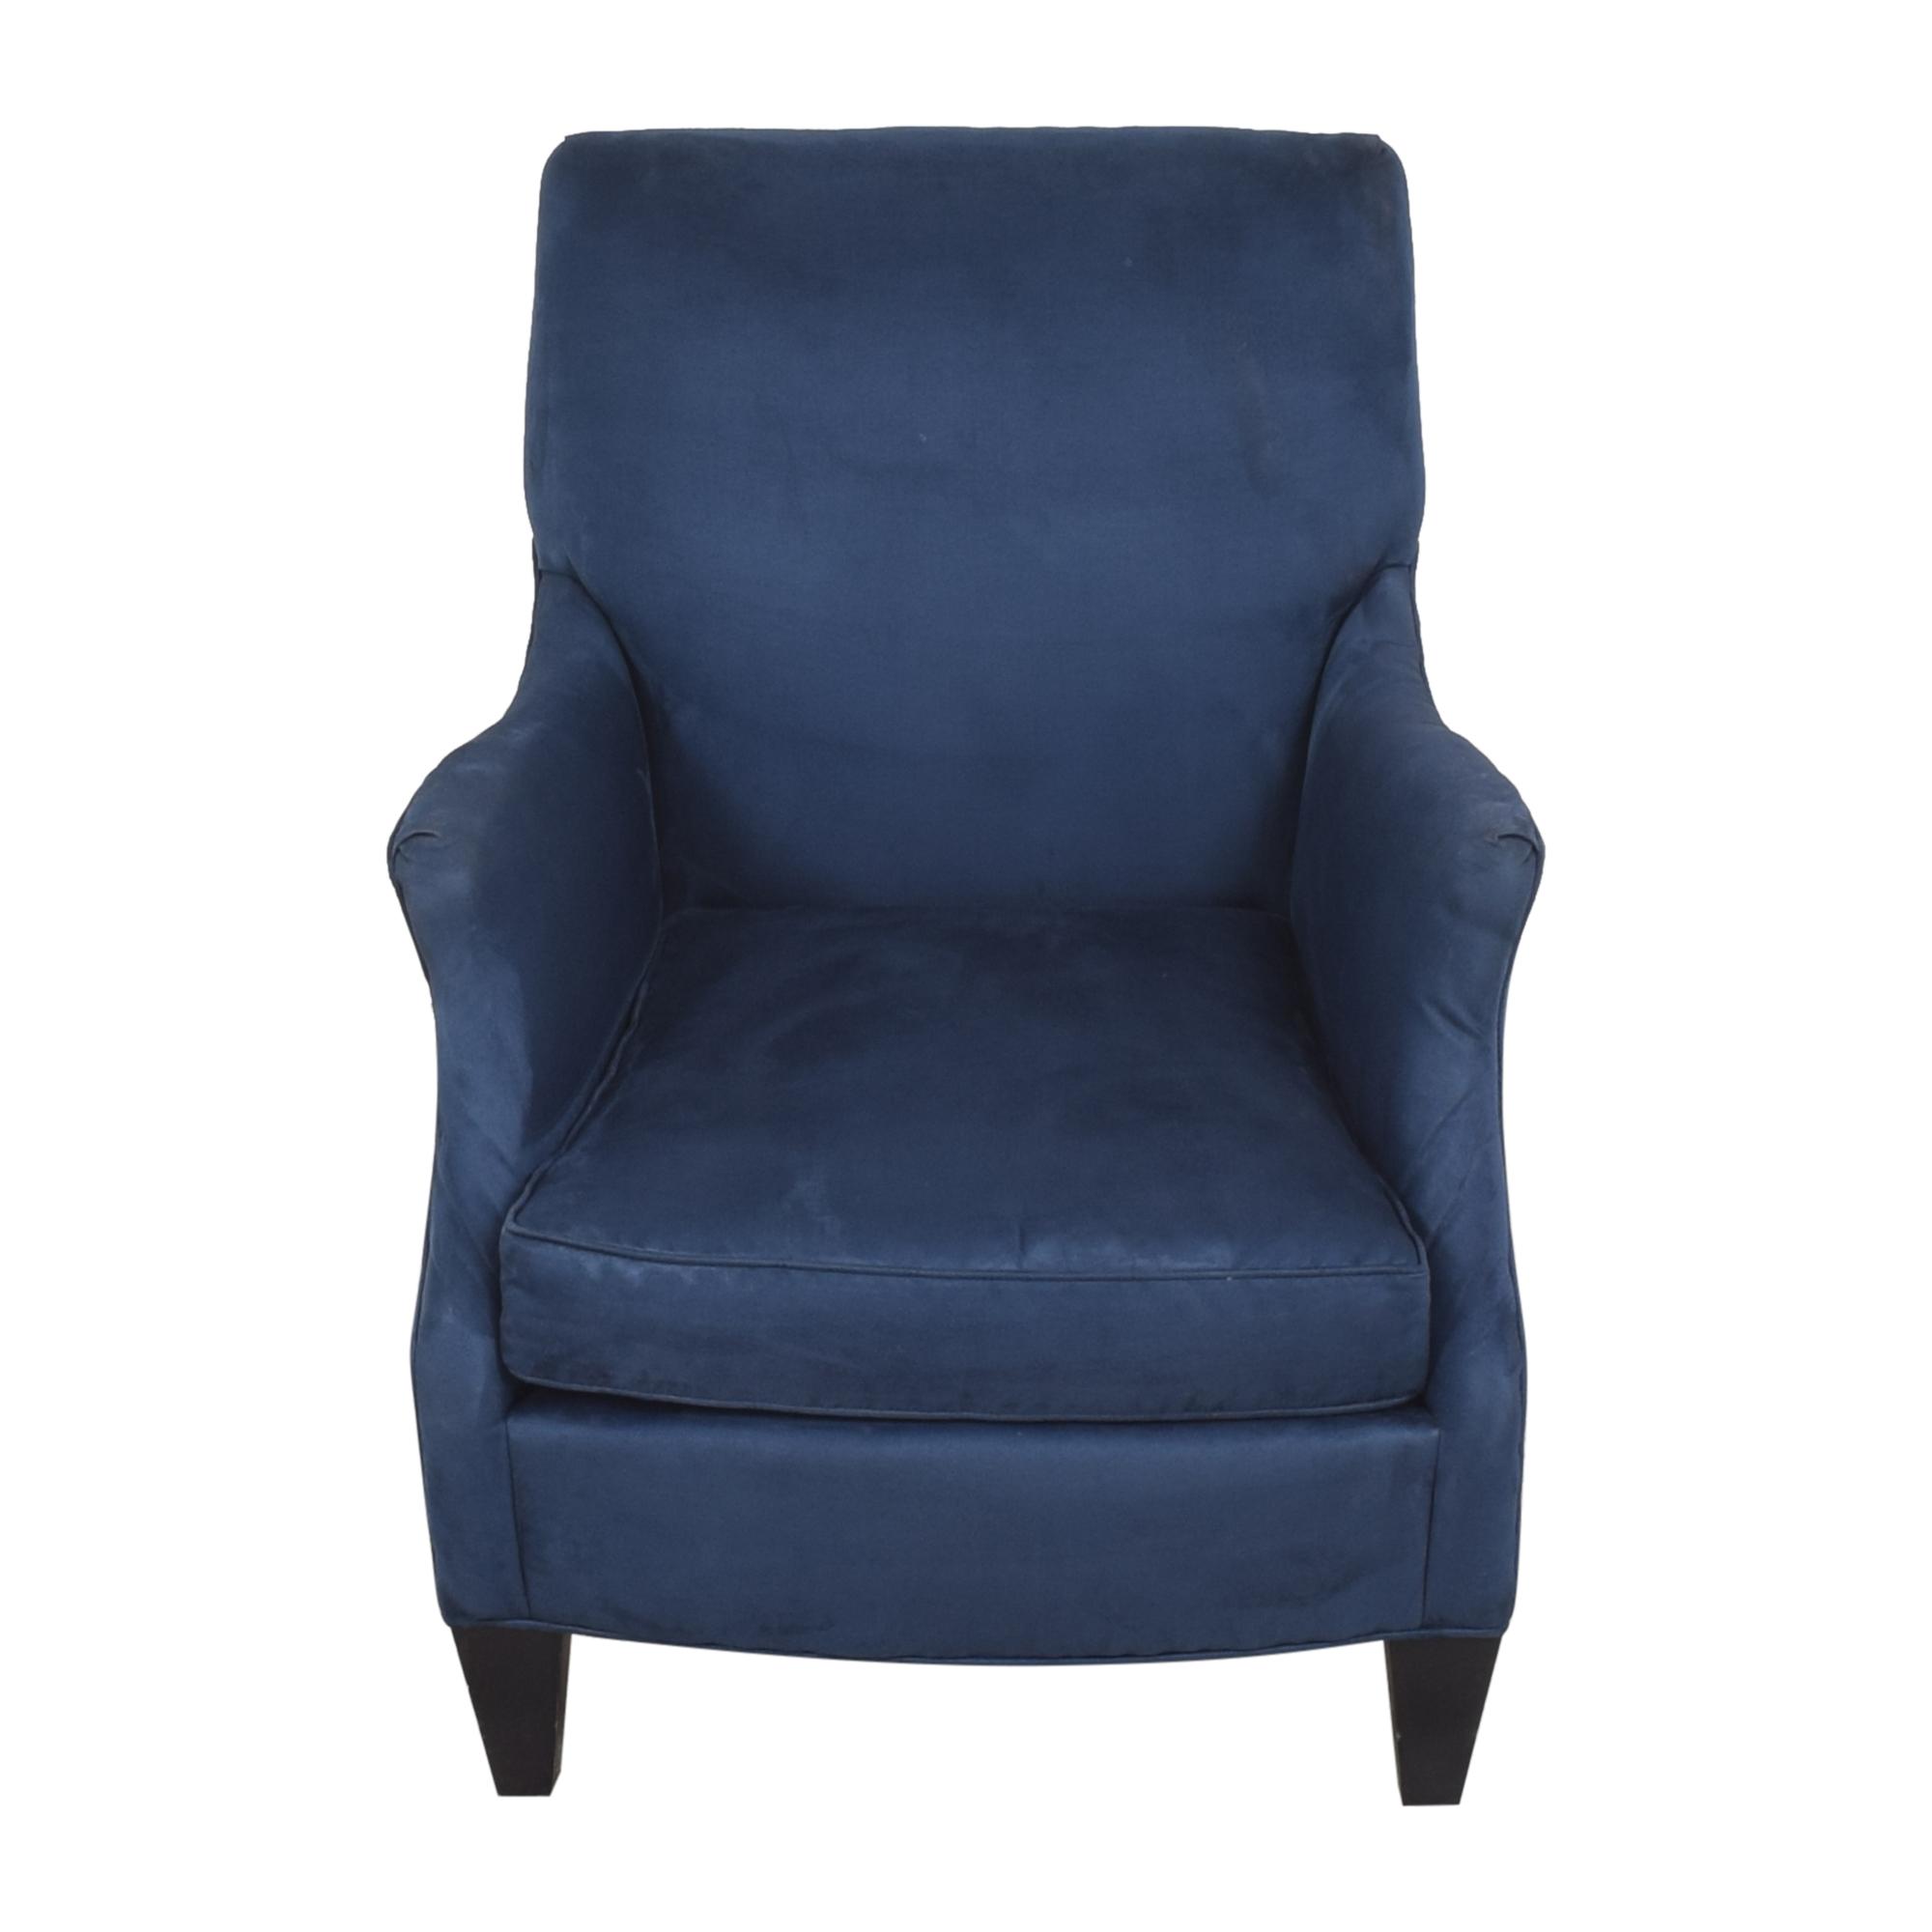 Ballard Designs Ballard Designs Accent Chair ct